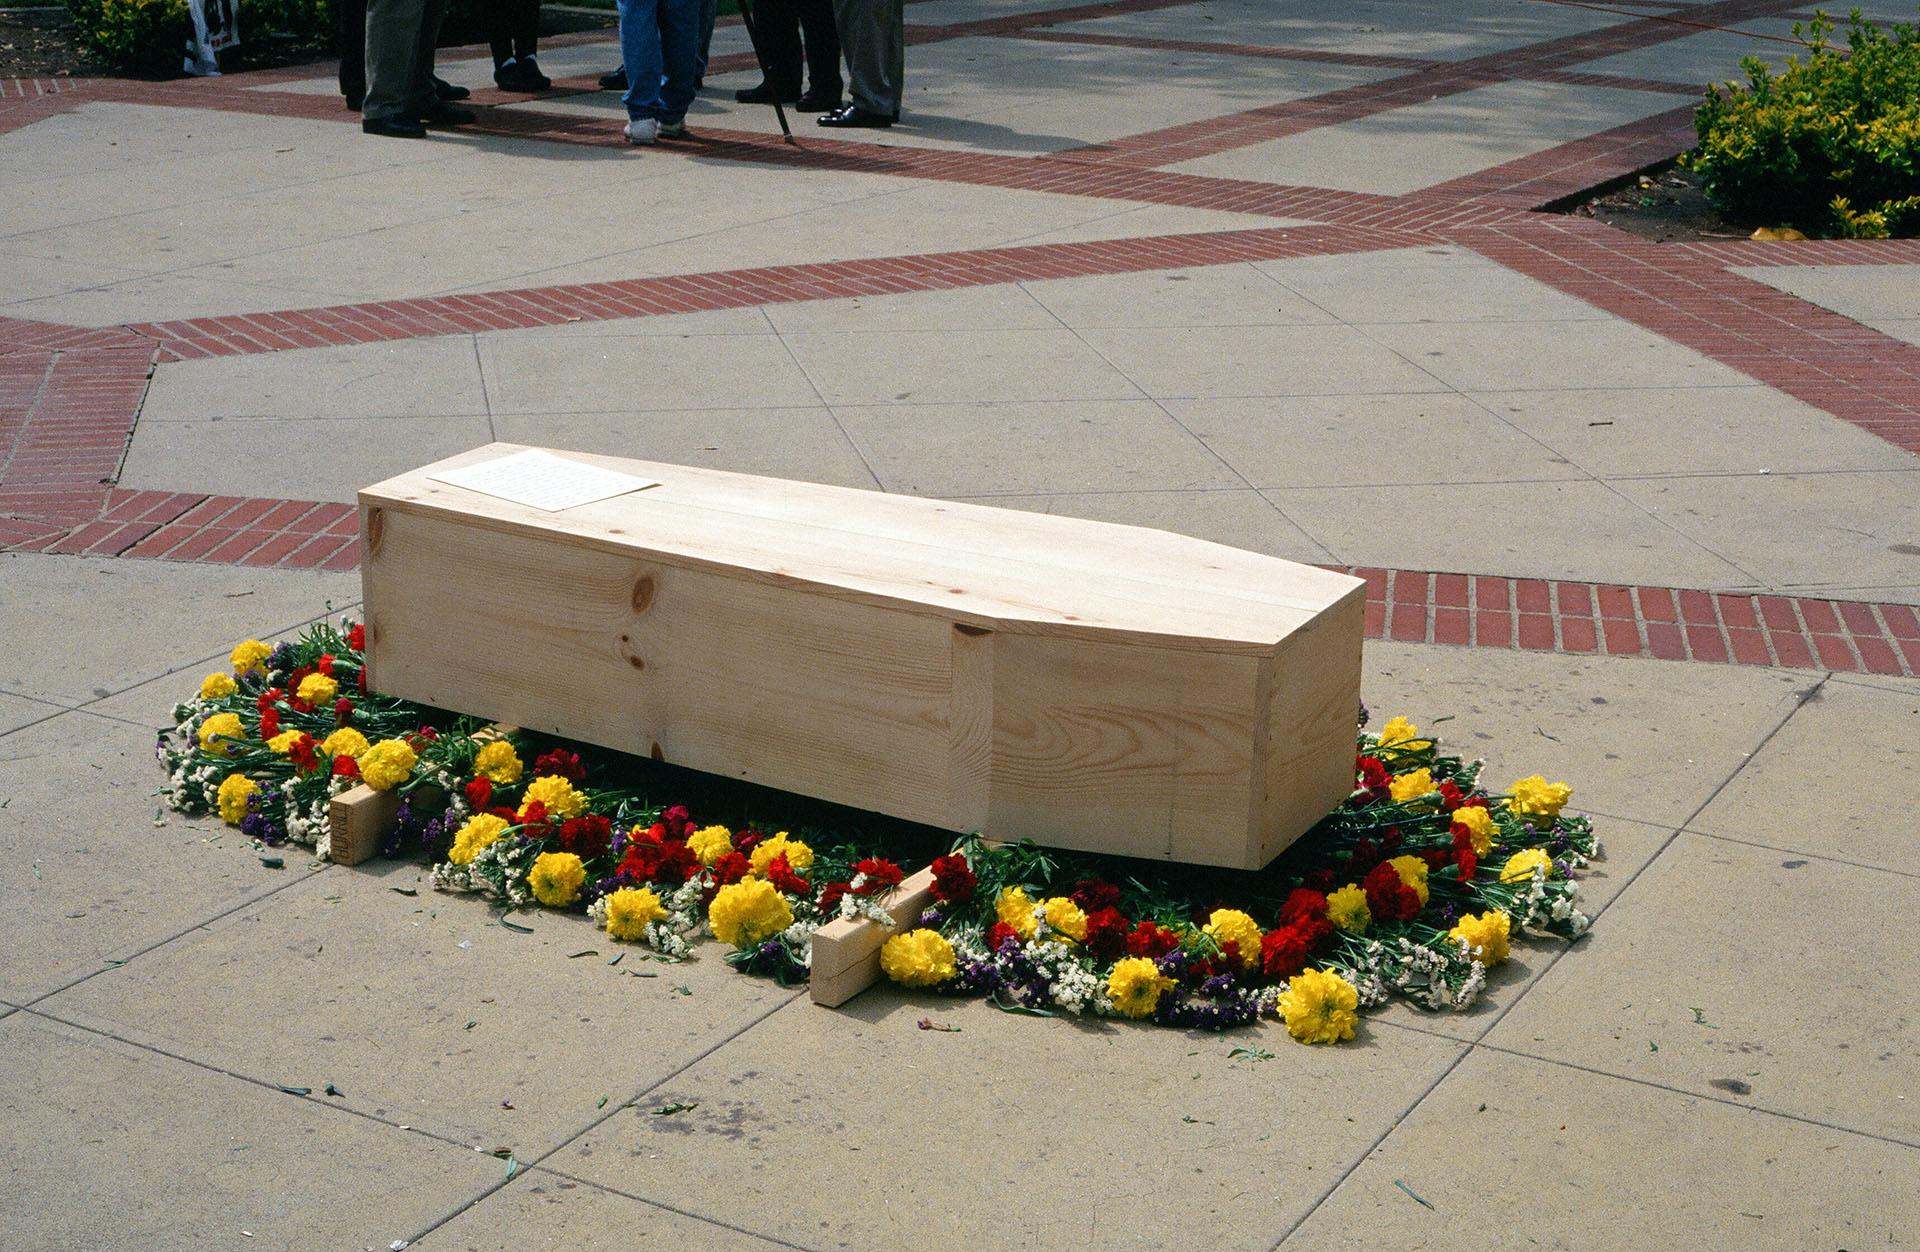 coffin-ucla-300dpi.jpg